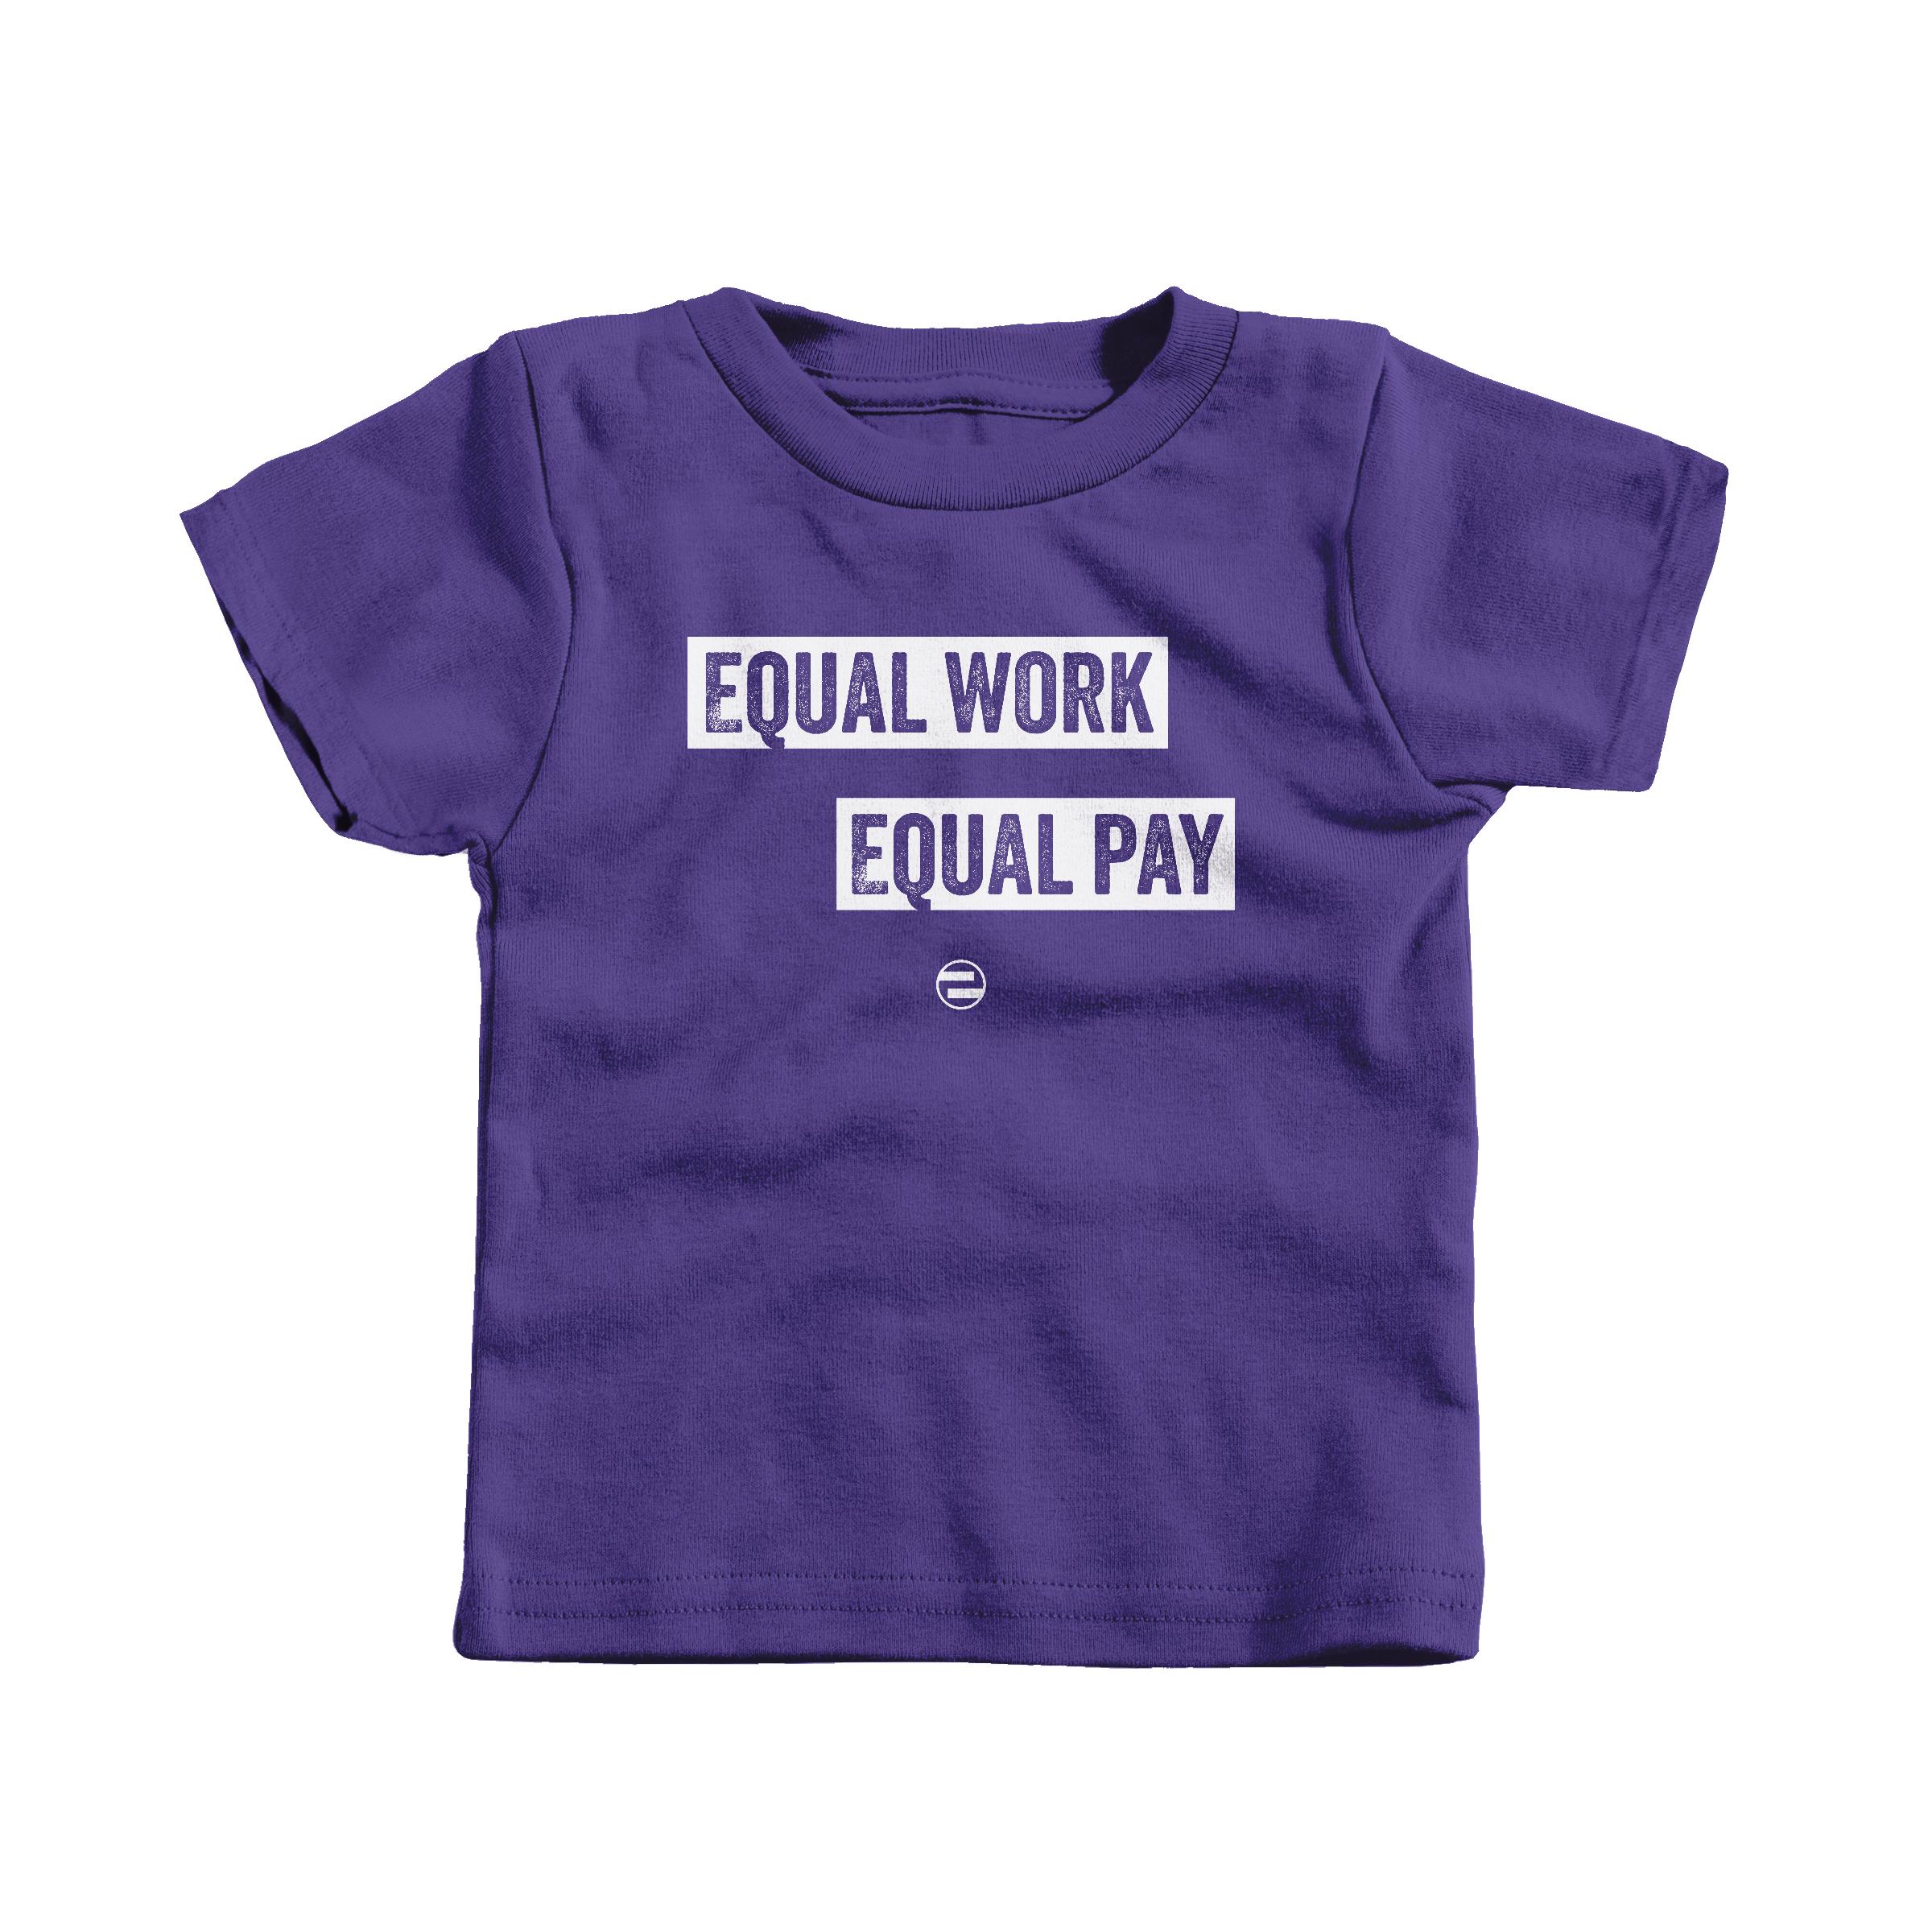 "GenEquality ""Equal Work Equal Pay"" Kids Tee & Onesie Purple (T-Shirt)"